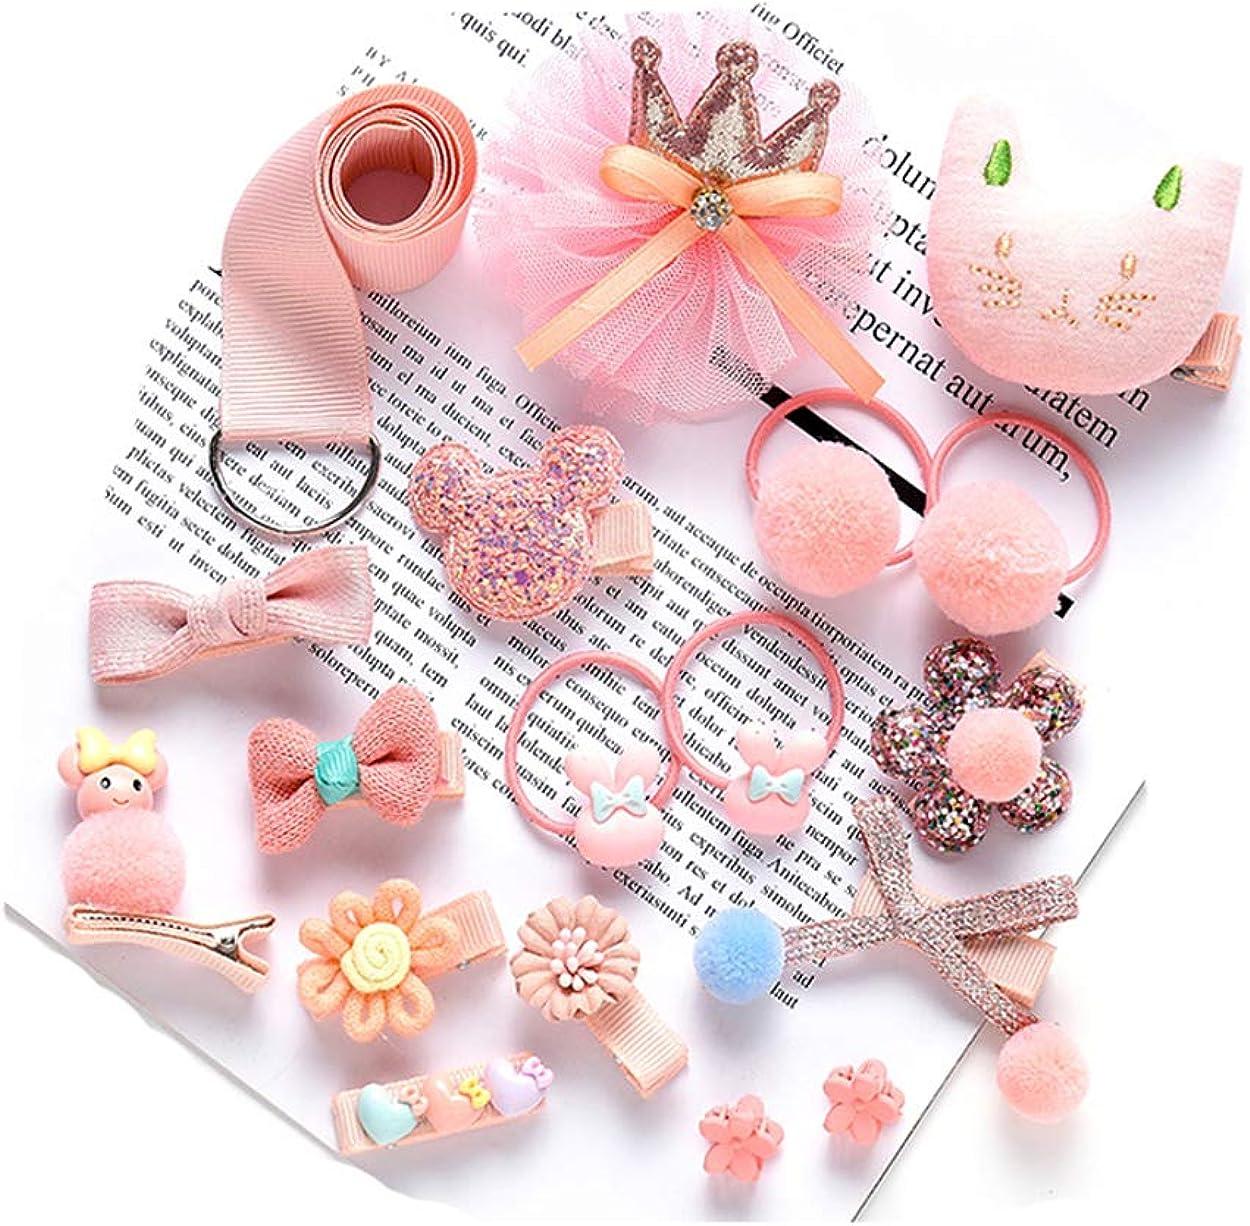 Lumsinker 18 Pcs Baby Girl Hair Gift Set Hair Clips Hair Ties Claw Barrettes Headwear